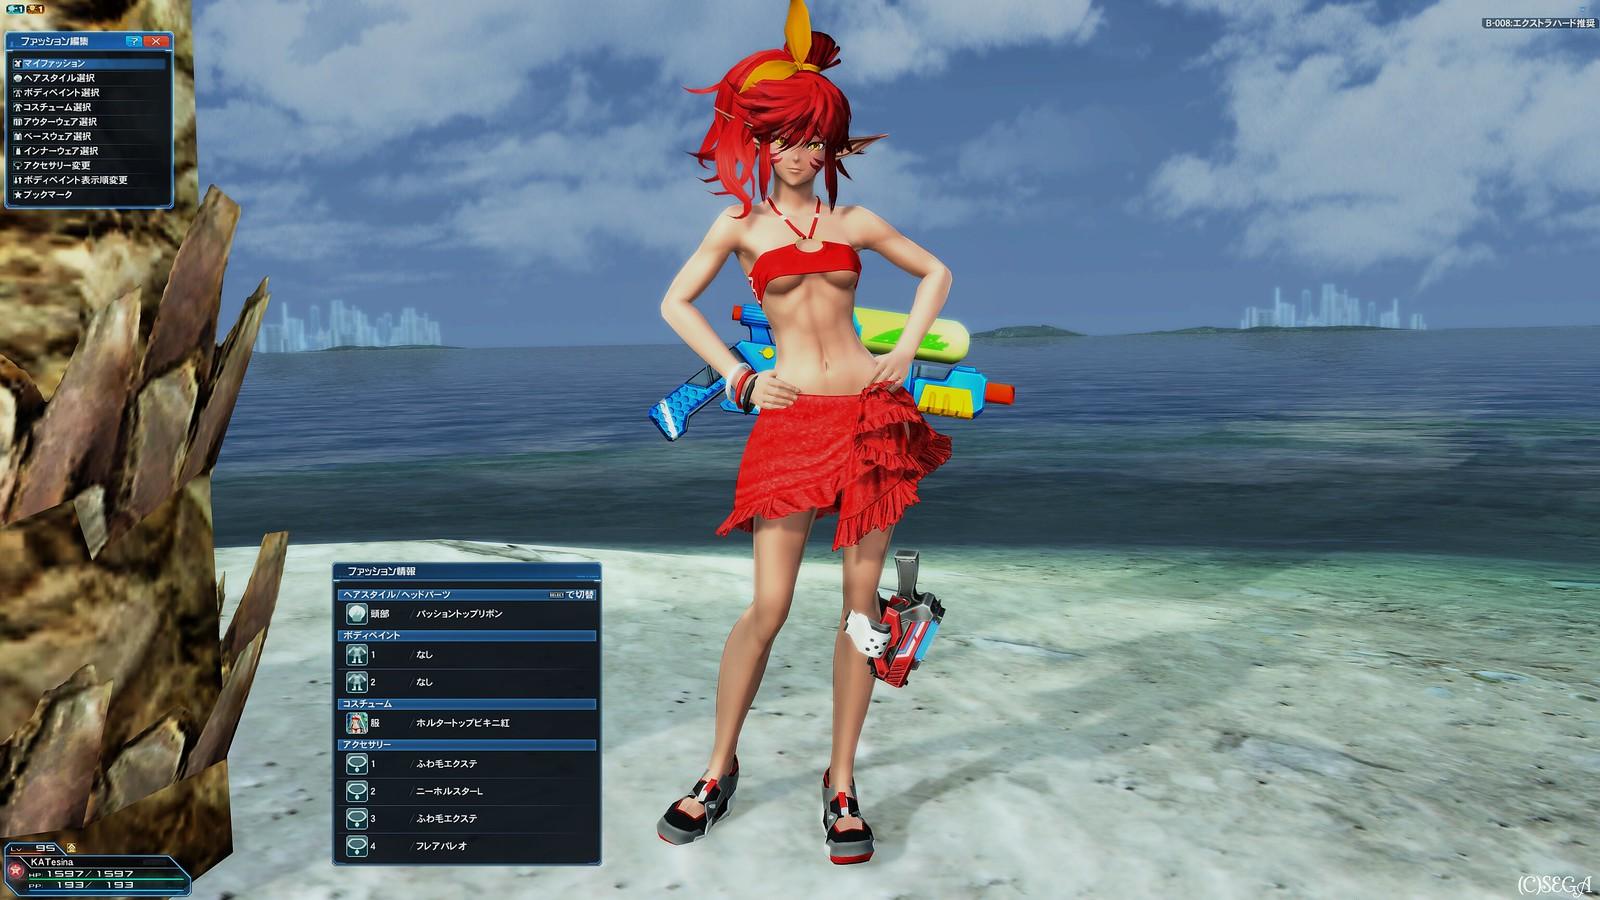 Phantasy Star Online 2 Screenshot 2020.07.26 - 11.26.51.86